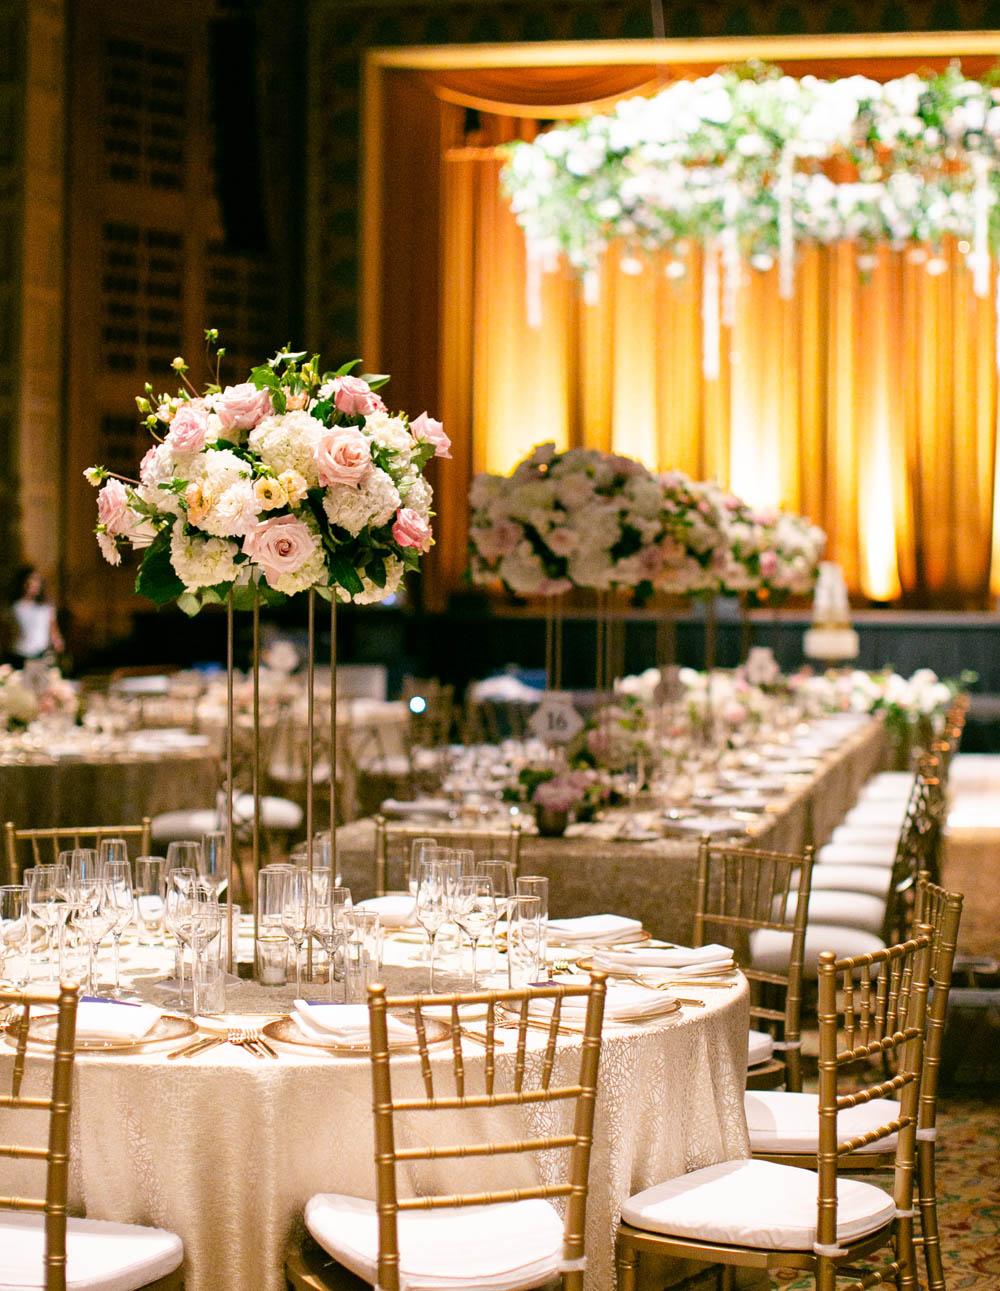 Portland Art Museum wedding dinner flowers